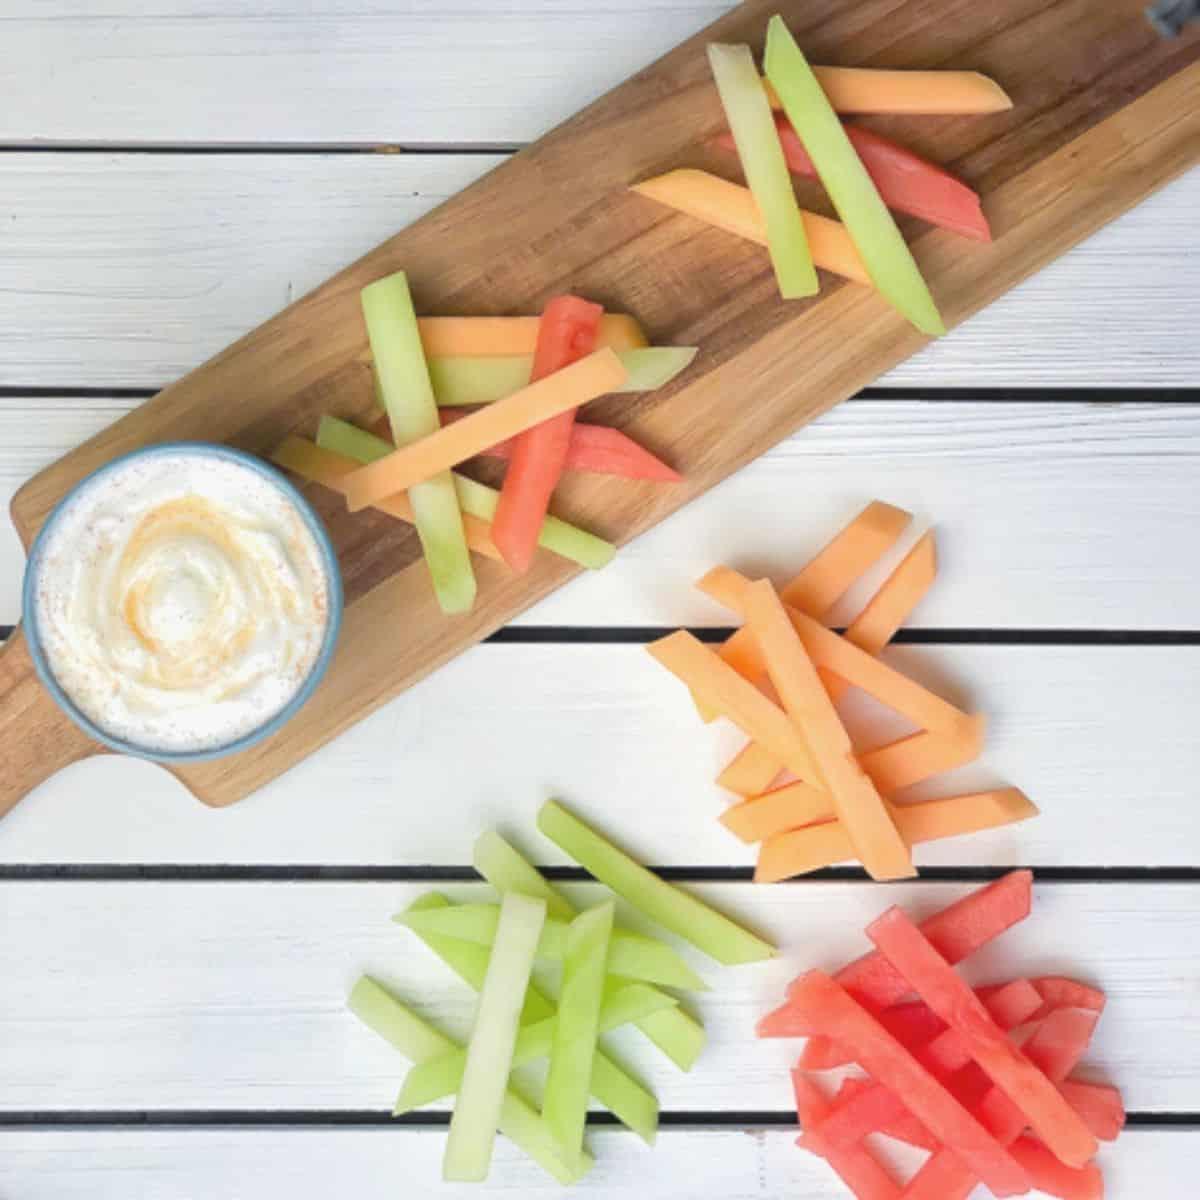 melon cut into sticks with yogurt dip